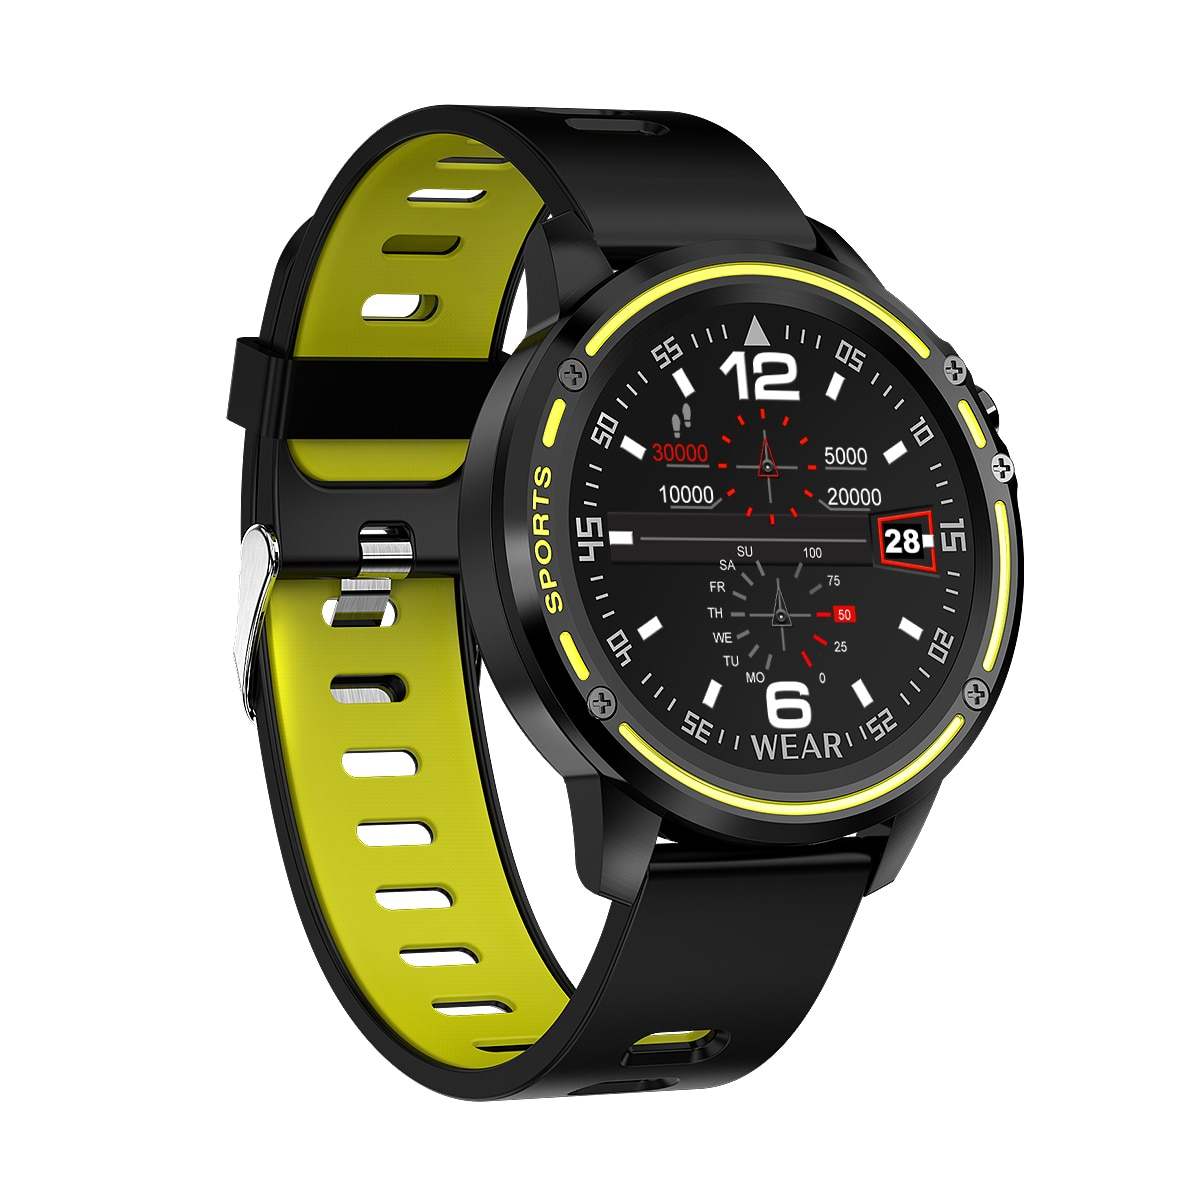 2020 männer Frauen Smart Uhr L8 Herz Rate Smart Uhren Uhr Relogio Android Psg Amazefit Ticwatch Android Amazifit Bip Oliphants